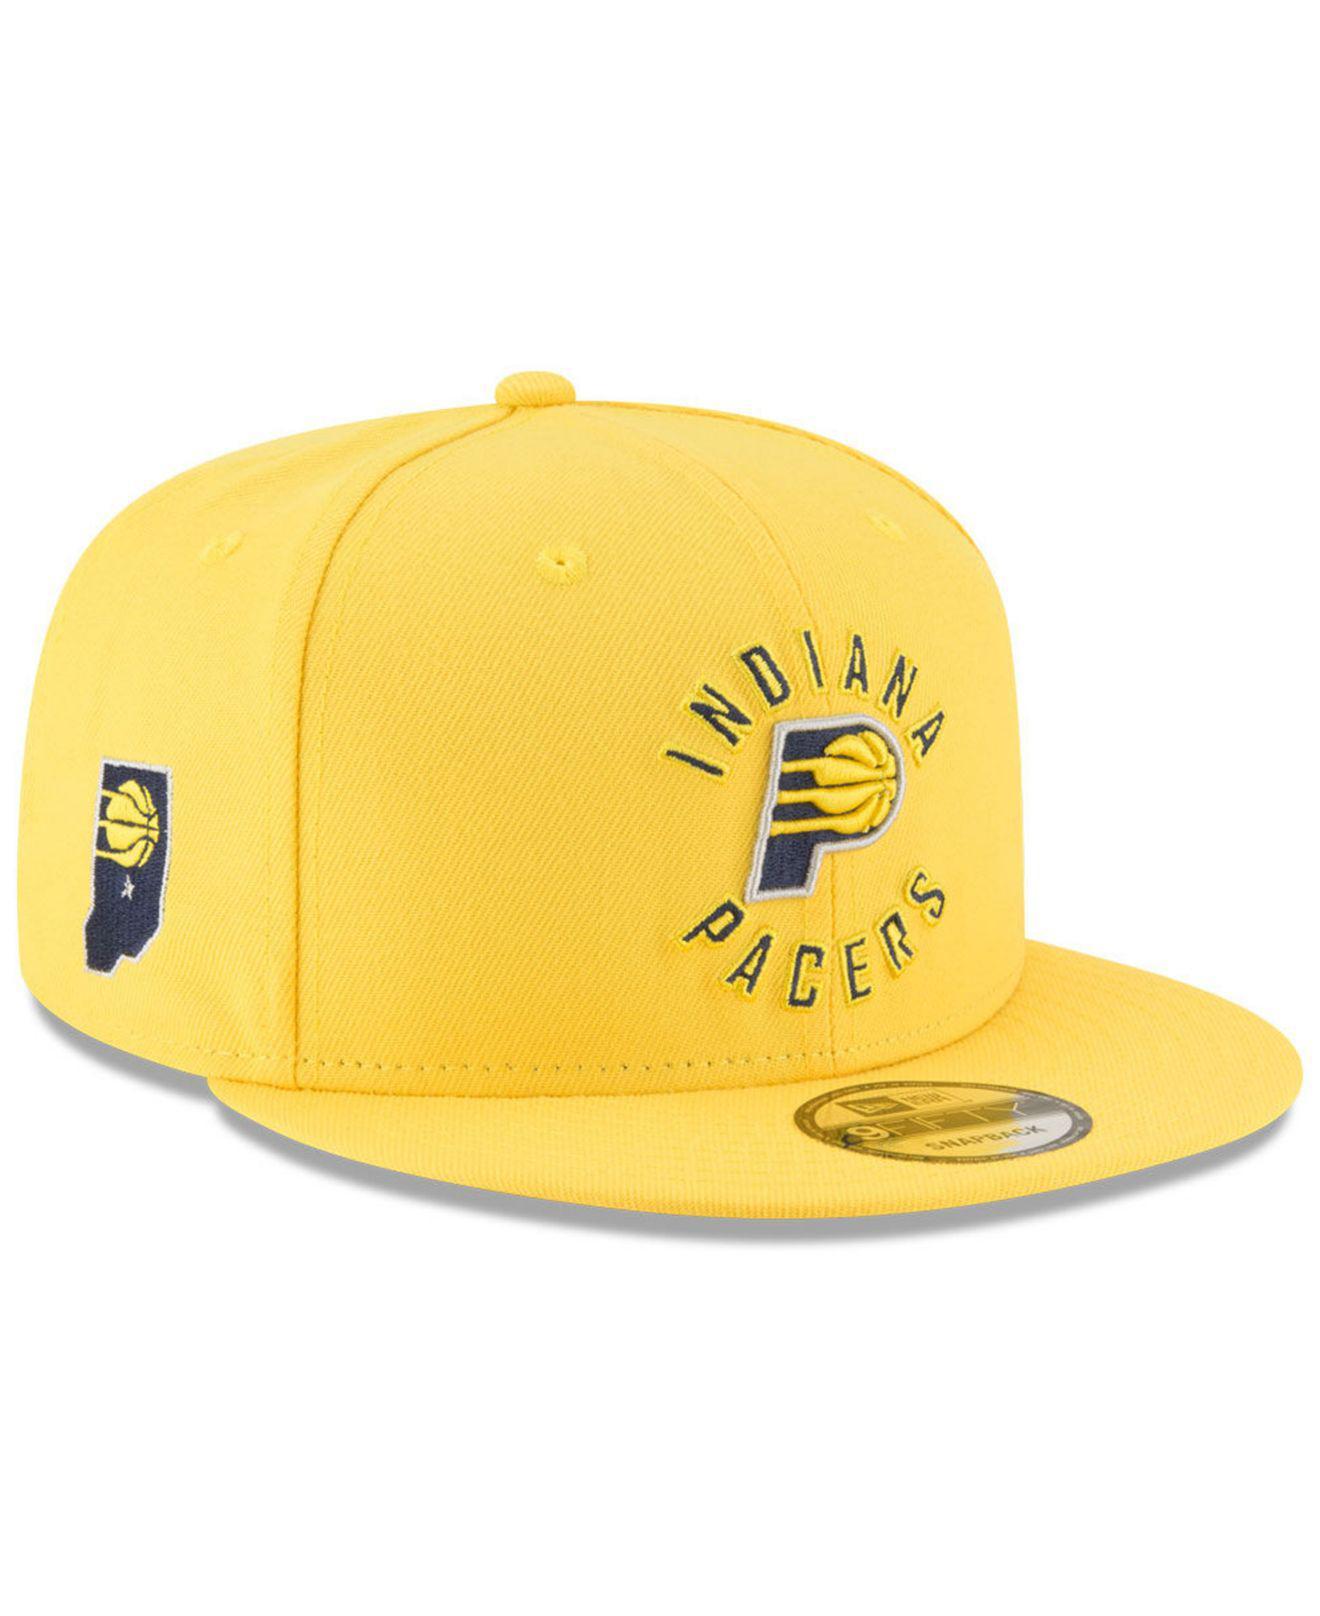 reputable site 5ac2f 715f0 ... australia ktz. yellow statement jersey hook 9fifty snapback cap 00c77  4459b